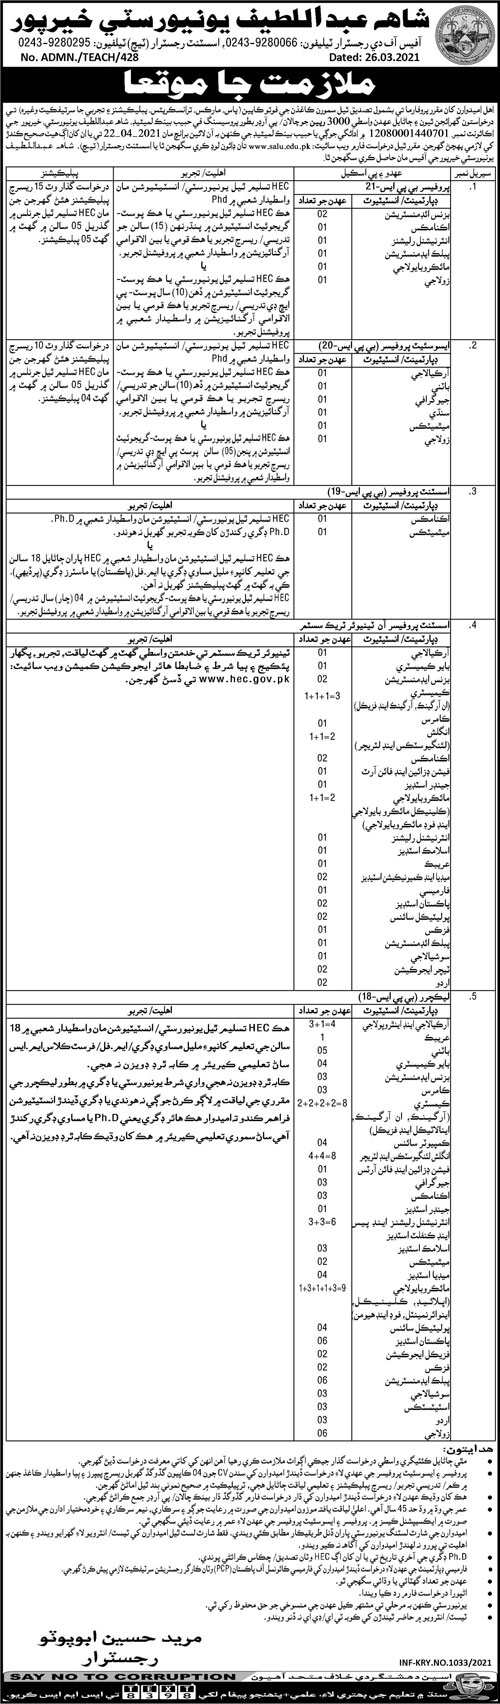 155 Posts in Shah Abdul Latif University Of Khairpur Jobs 2021 | Application Form